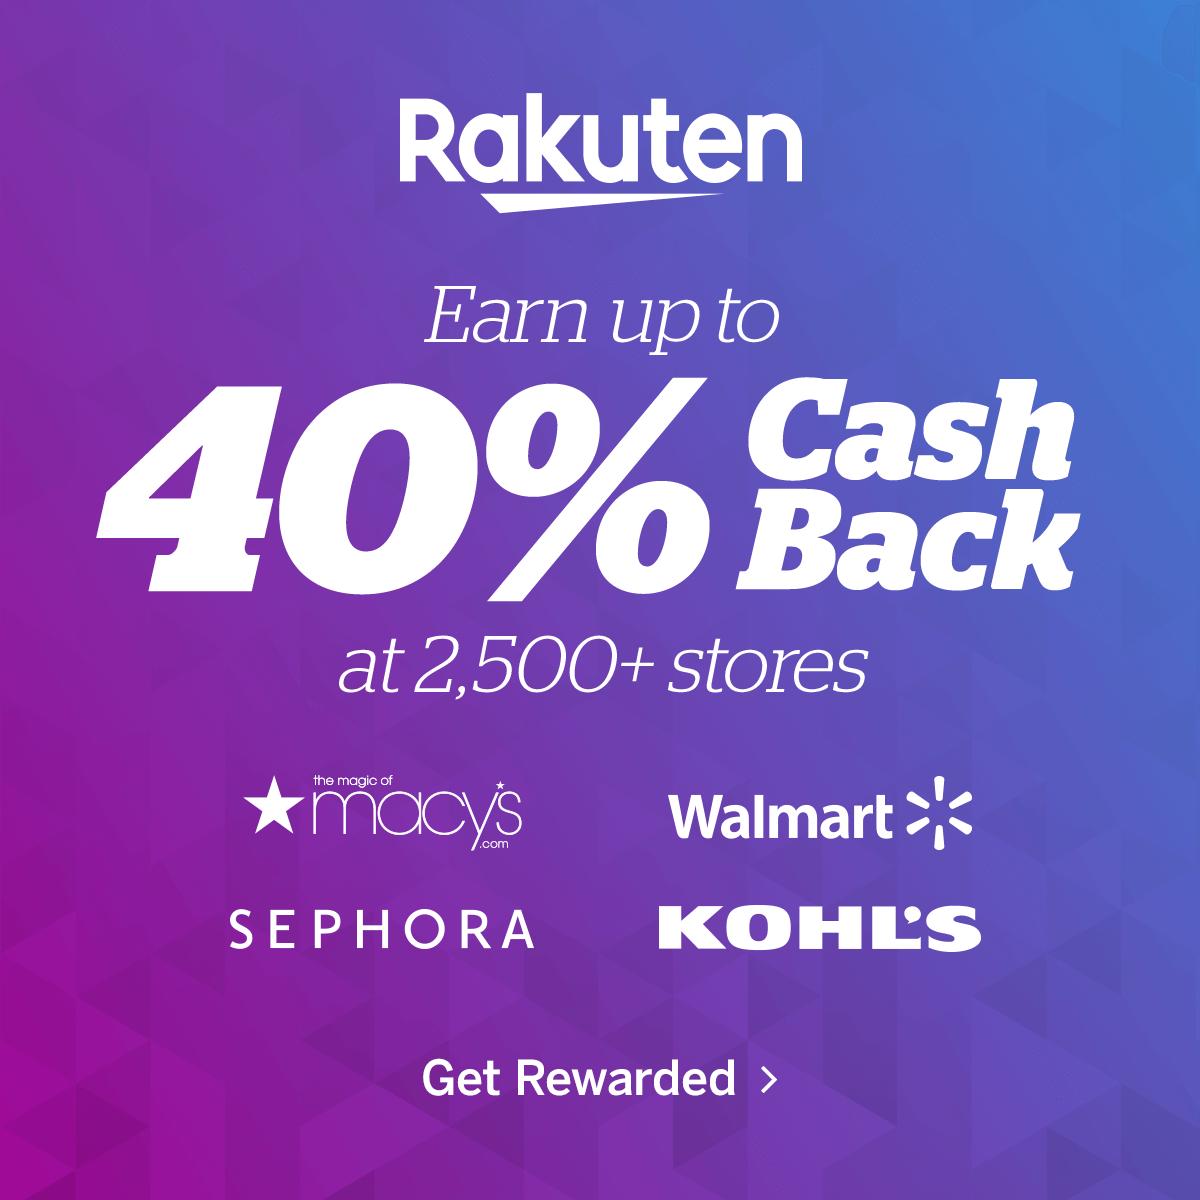 Rakuten - Earn up to 40% cash back